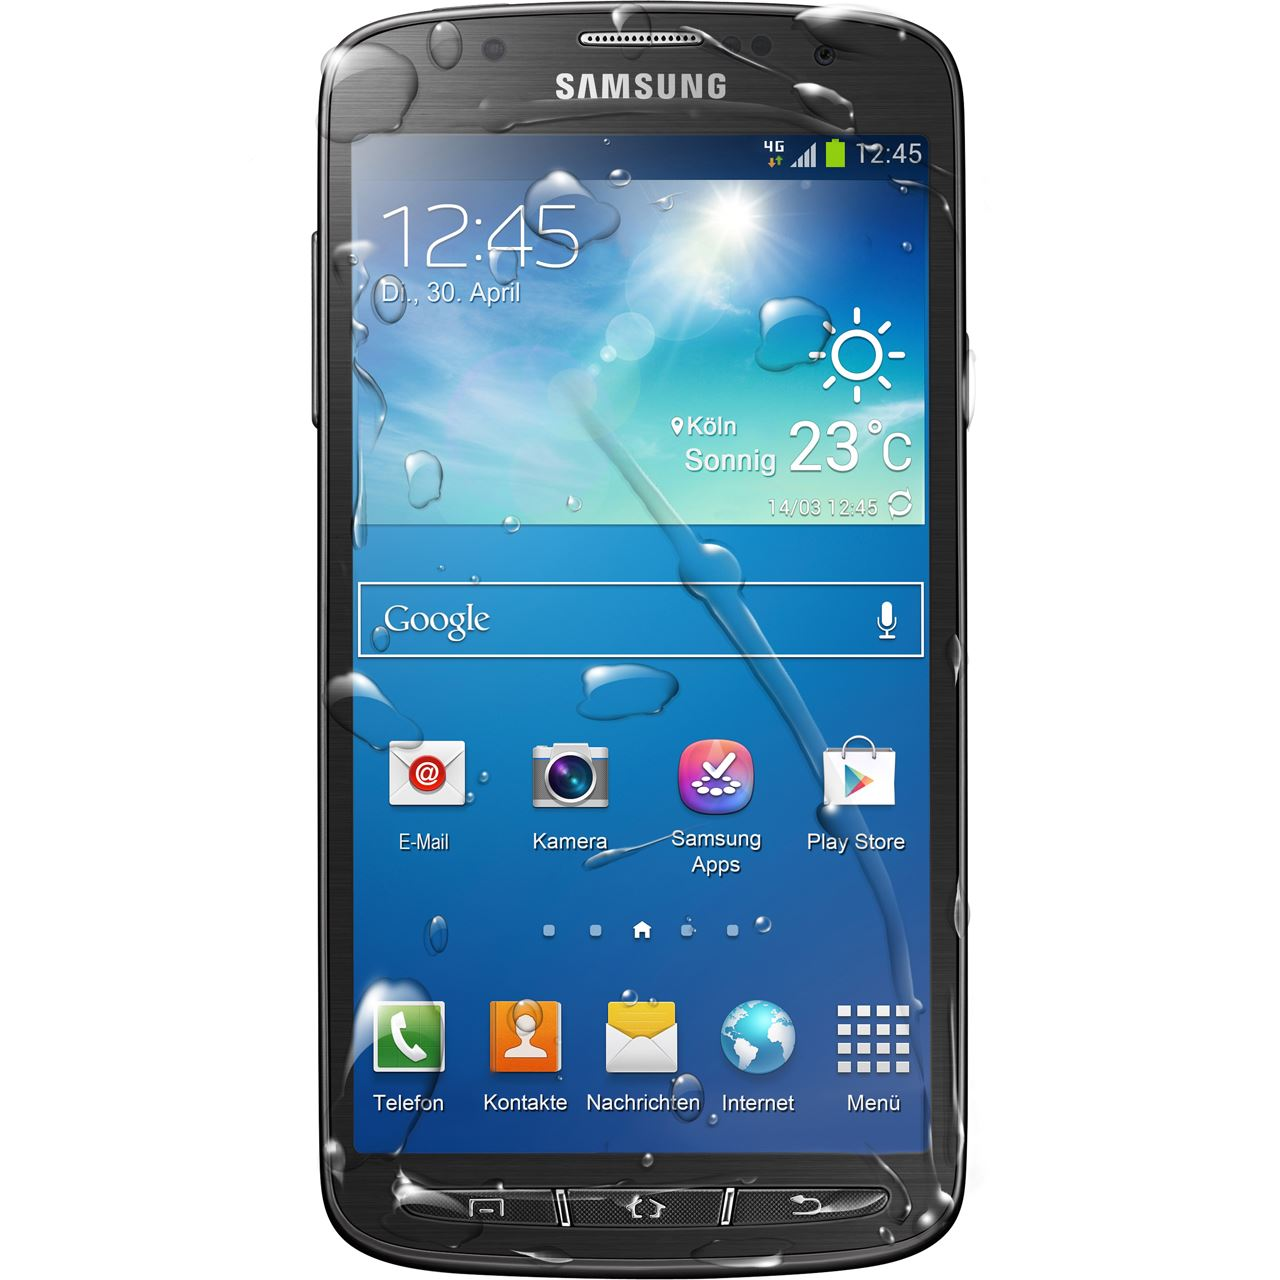 samsung galaxy s4 i9295 active 16 gb grau smartphones. Black Bedroom Furniture Sets. Home Design Ideas